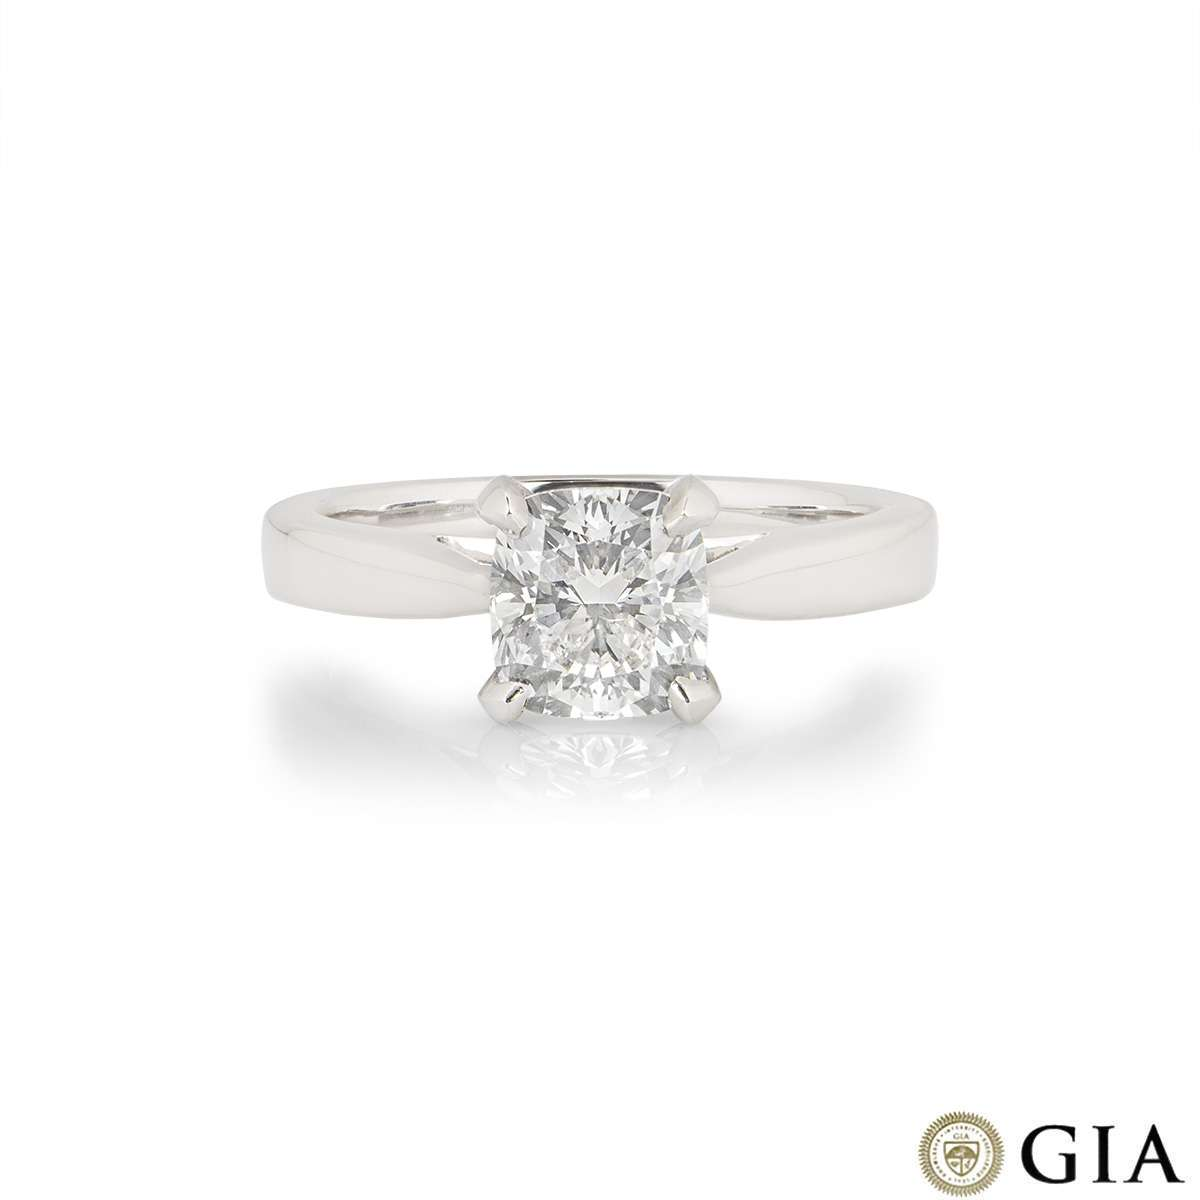 Platinum Cushion Cut Diamond Ring 1.51ct H/VS1